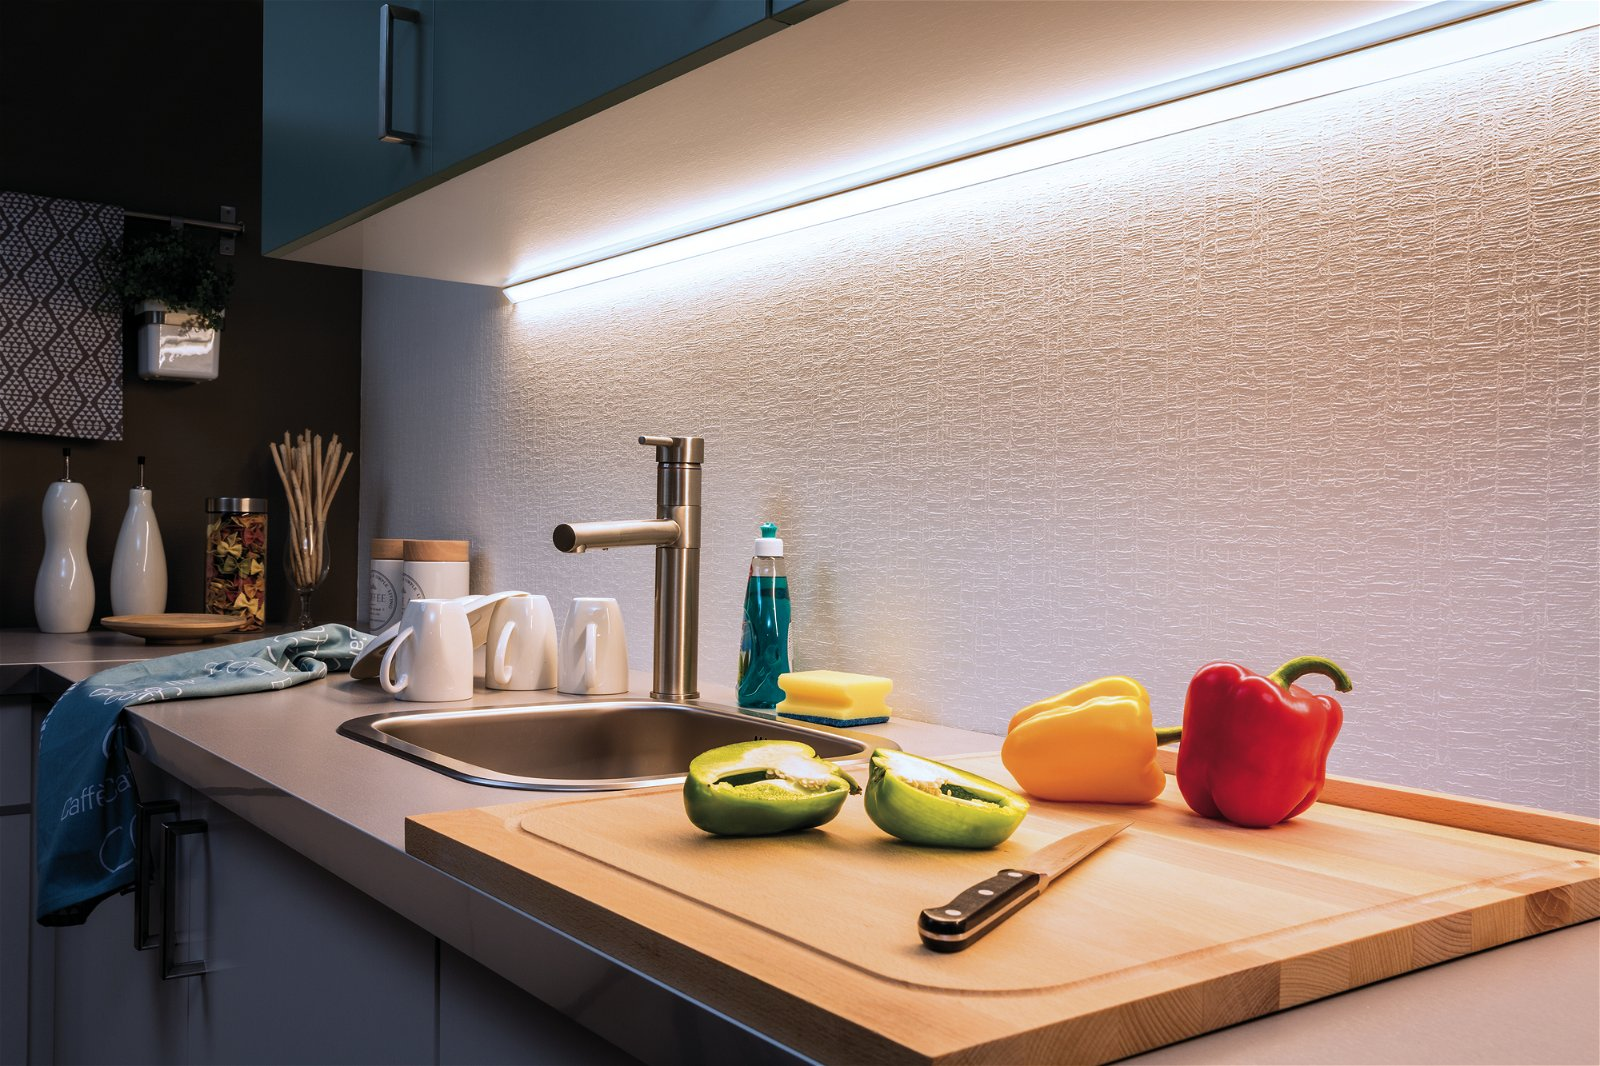 MaxLED 1000 Strip LED Blanc lumière 1,5m 17W 1100lm/m 6500K 36VA